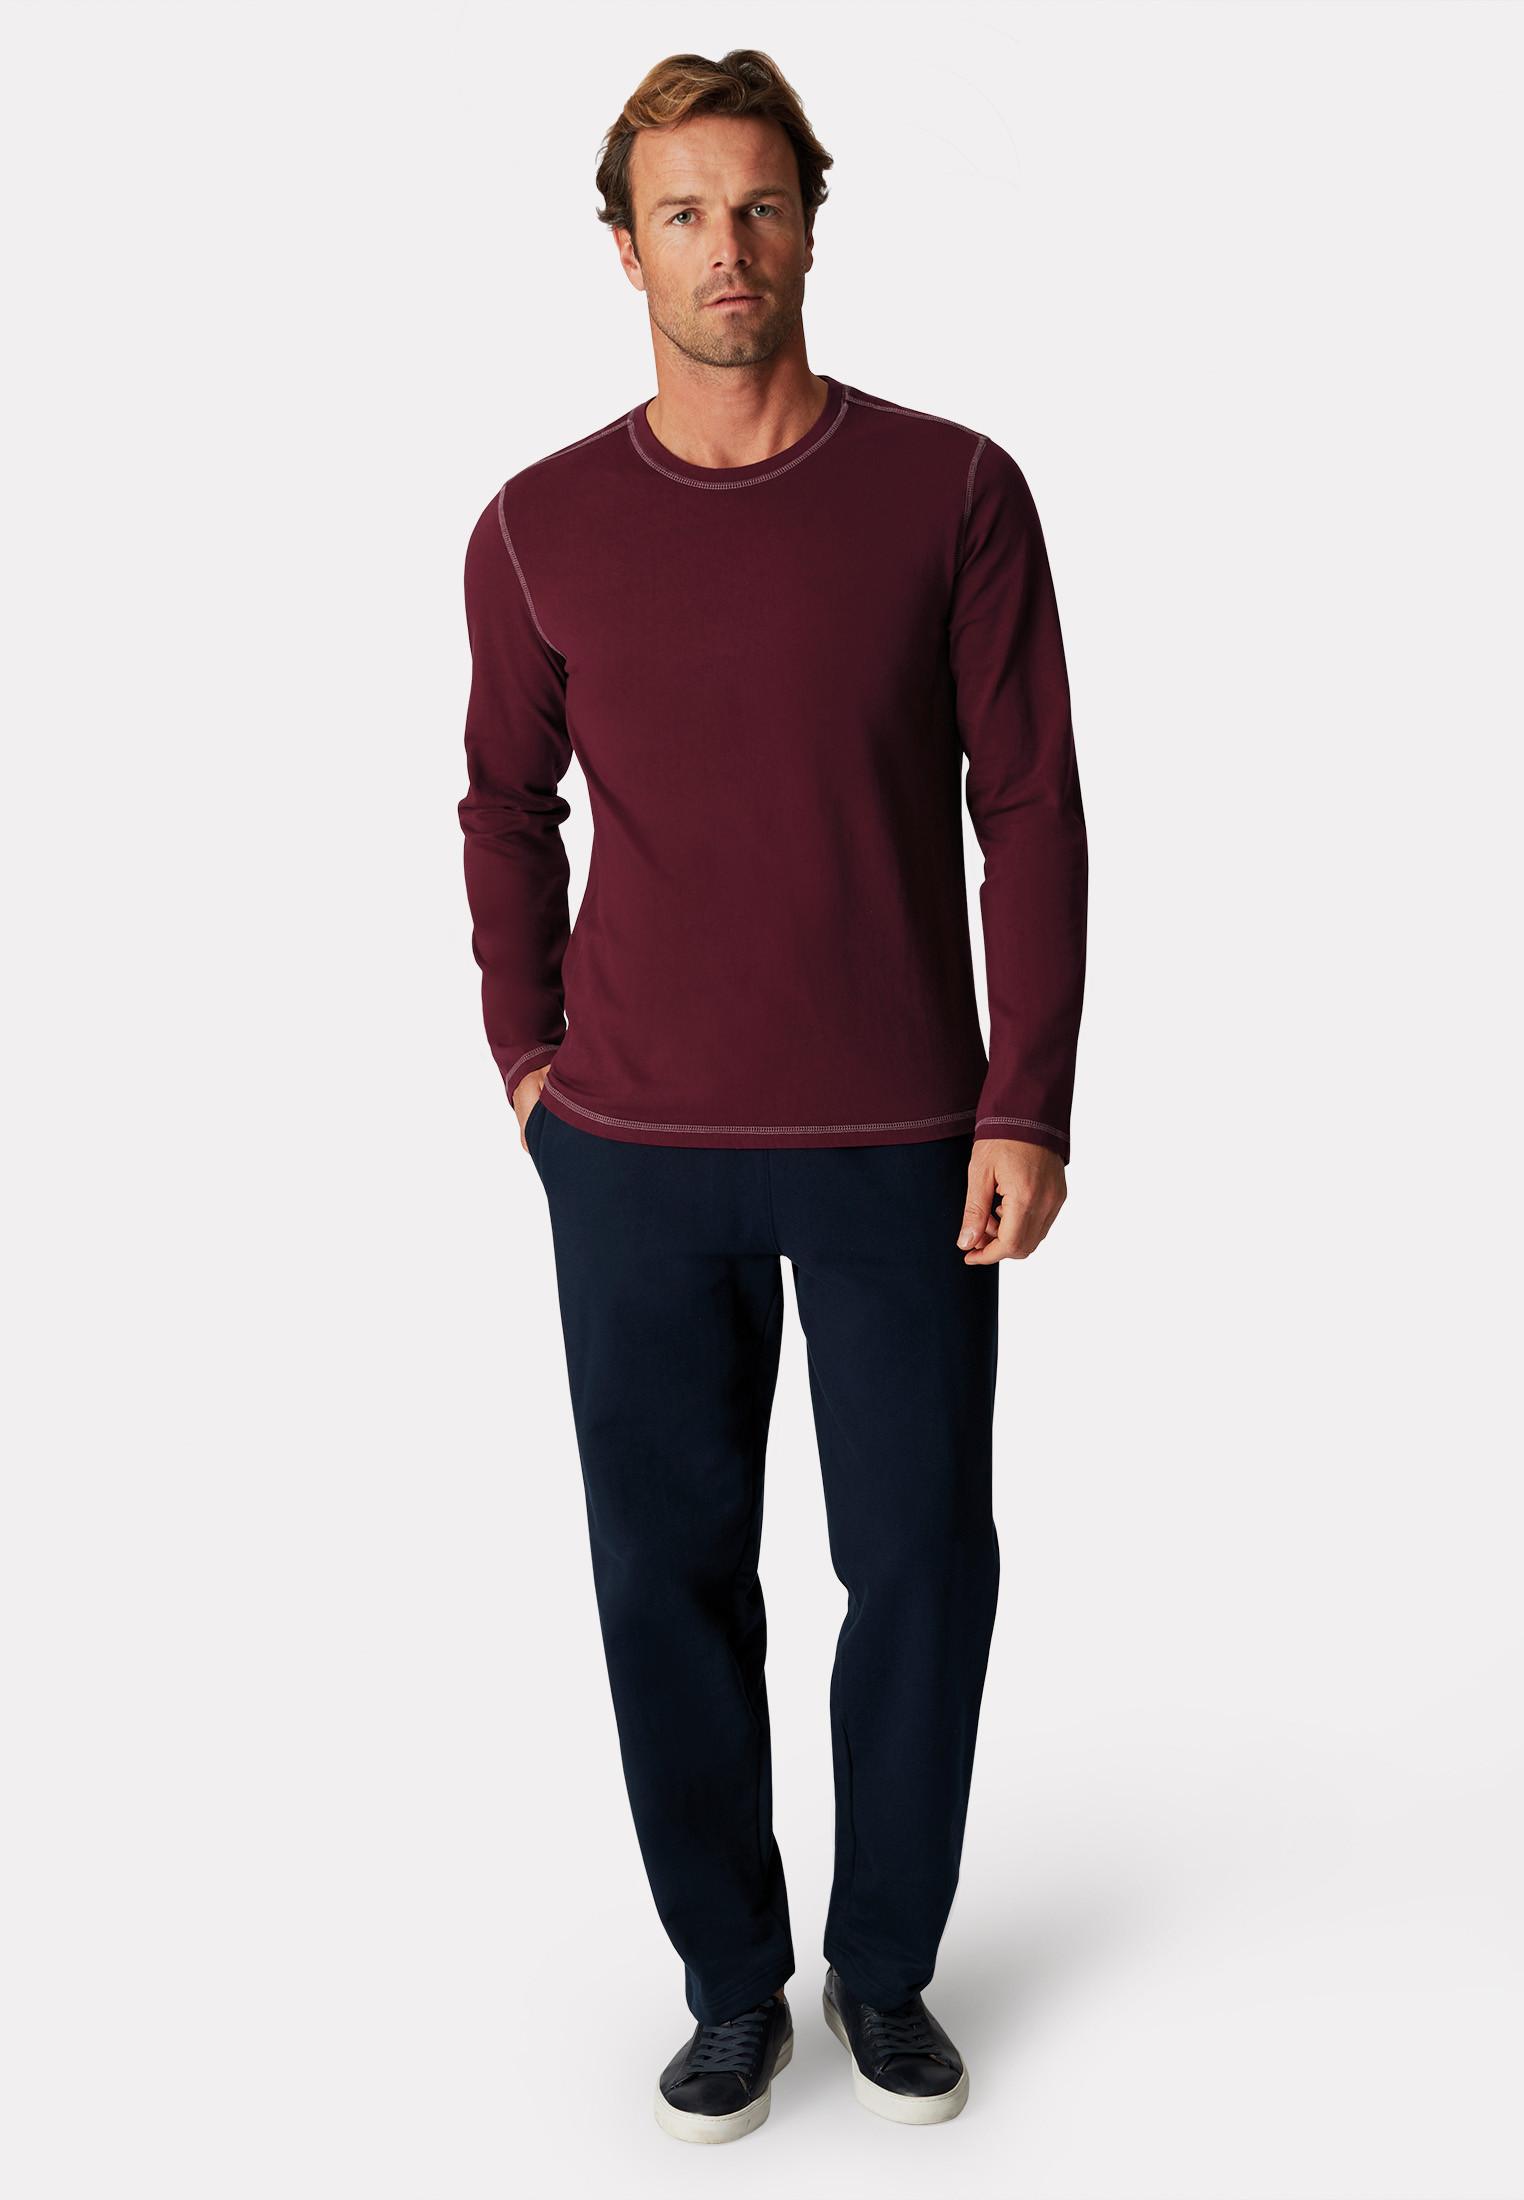 Bristol Wine Garment Washed Crew Neck Long Sleeve T-Shirt